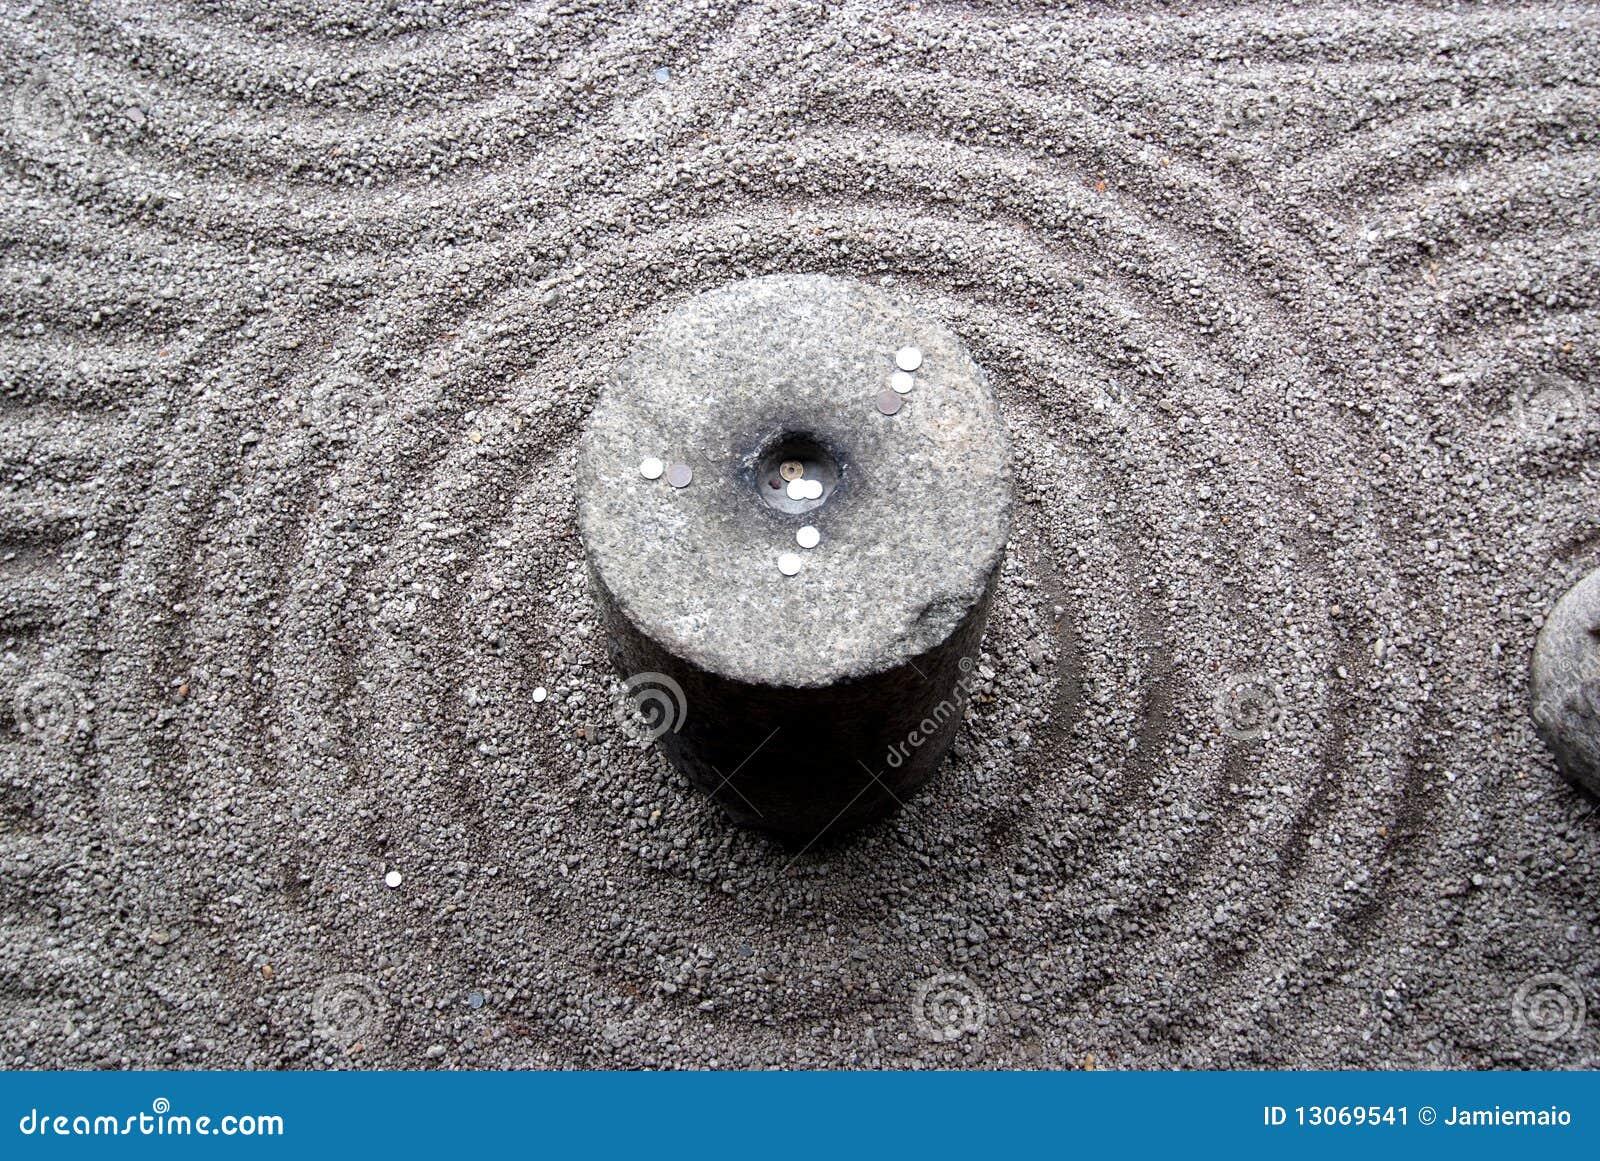 Jardín japonés del zen imagen de archivo. Imagen de meditación ...